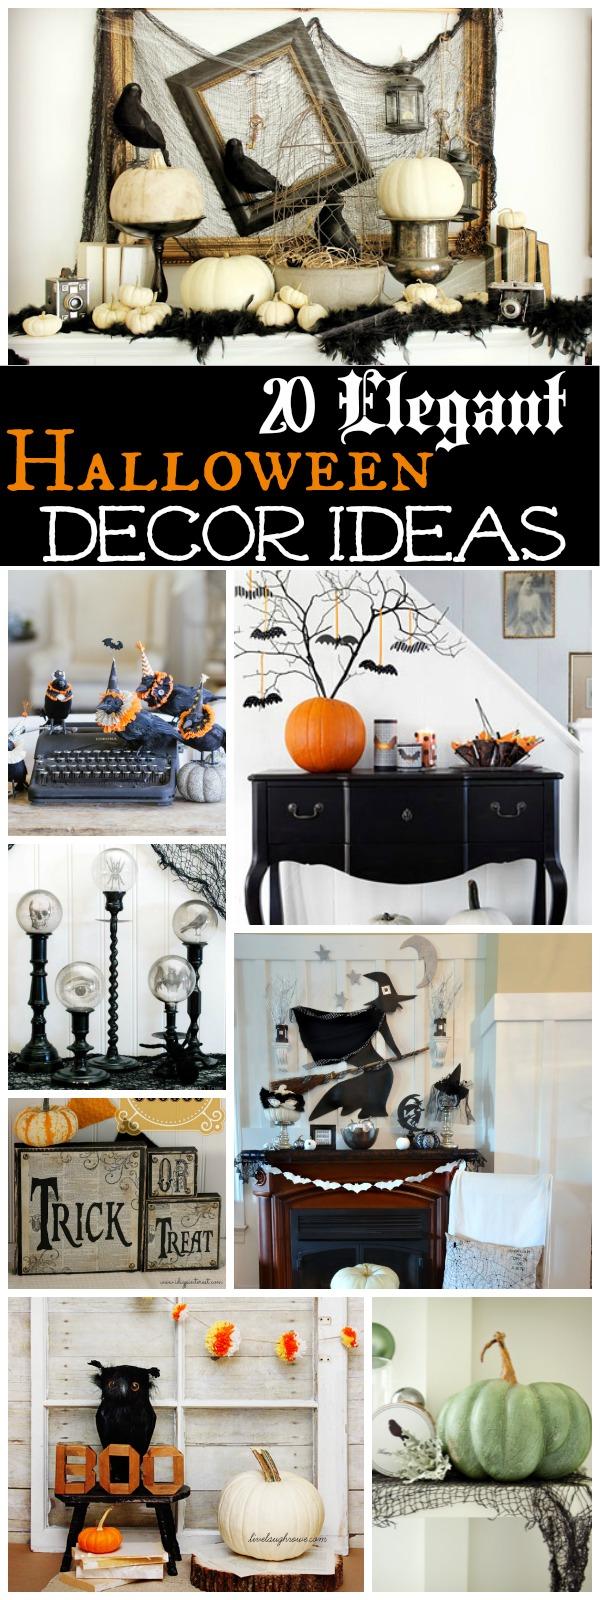 Elegant Halloween Decor Ideas at The Happy Housie